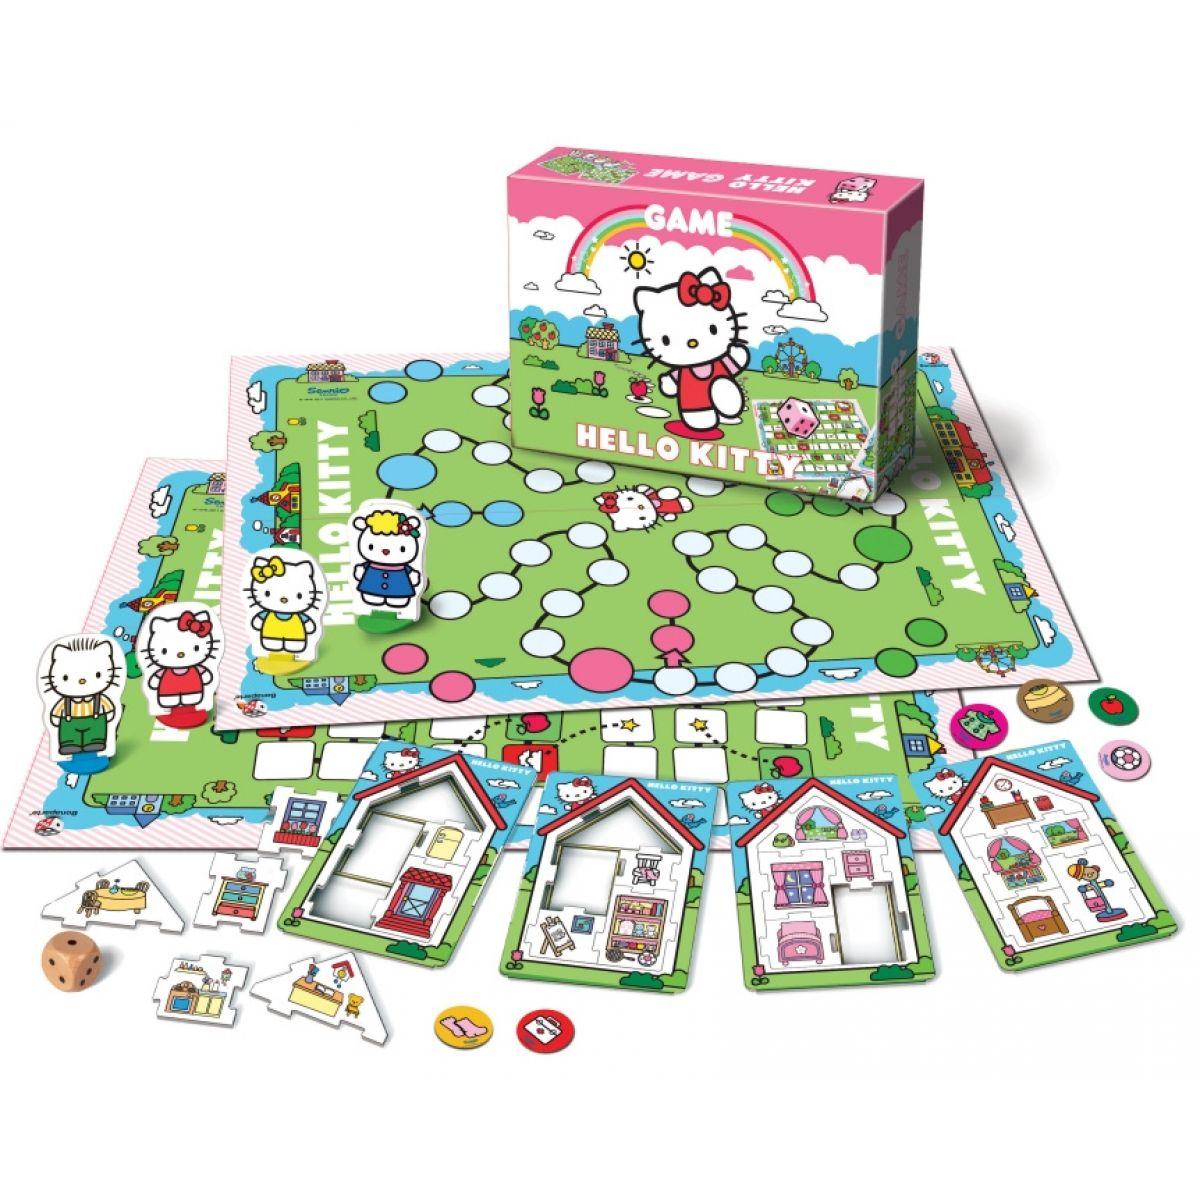 Bonaparte Společenská hra Hello Kitty velká hra